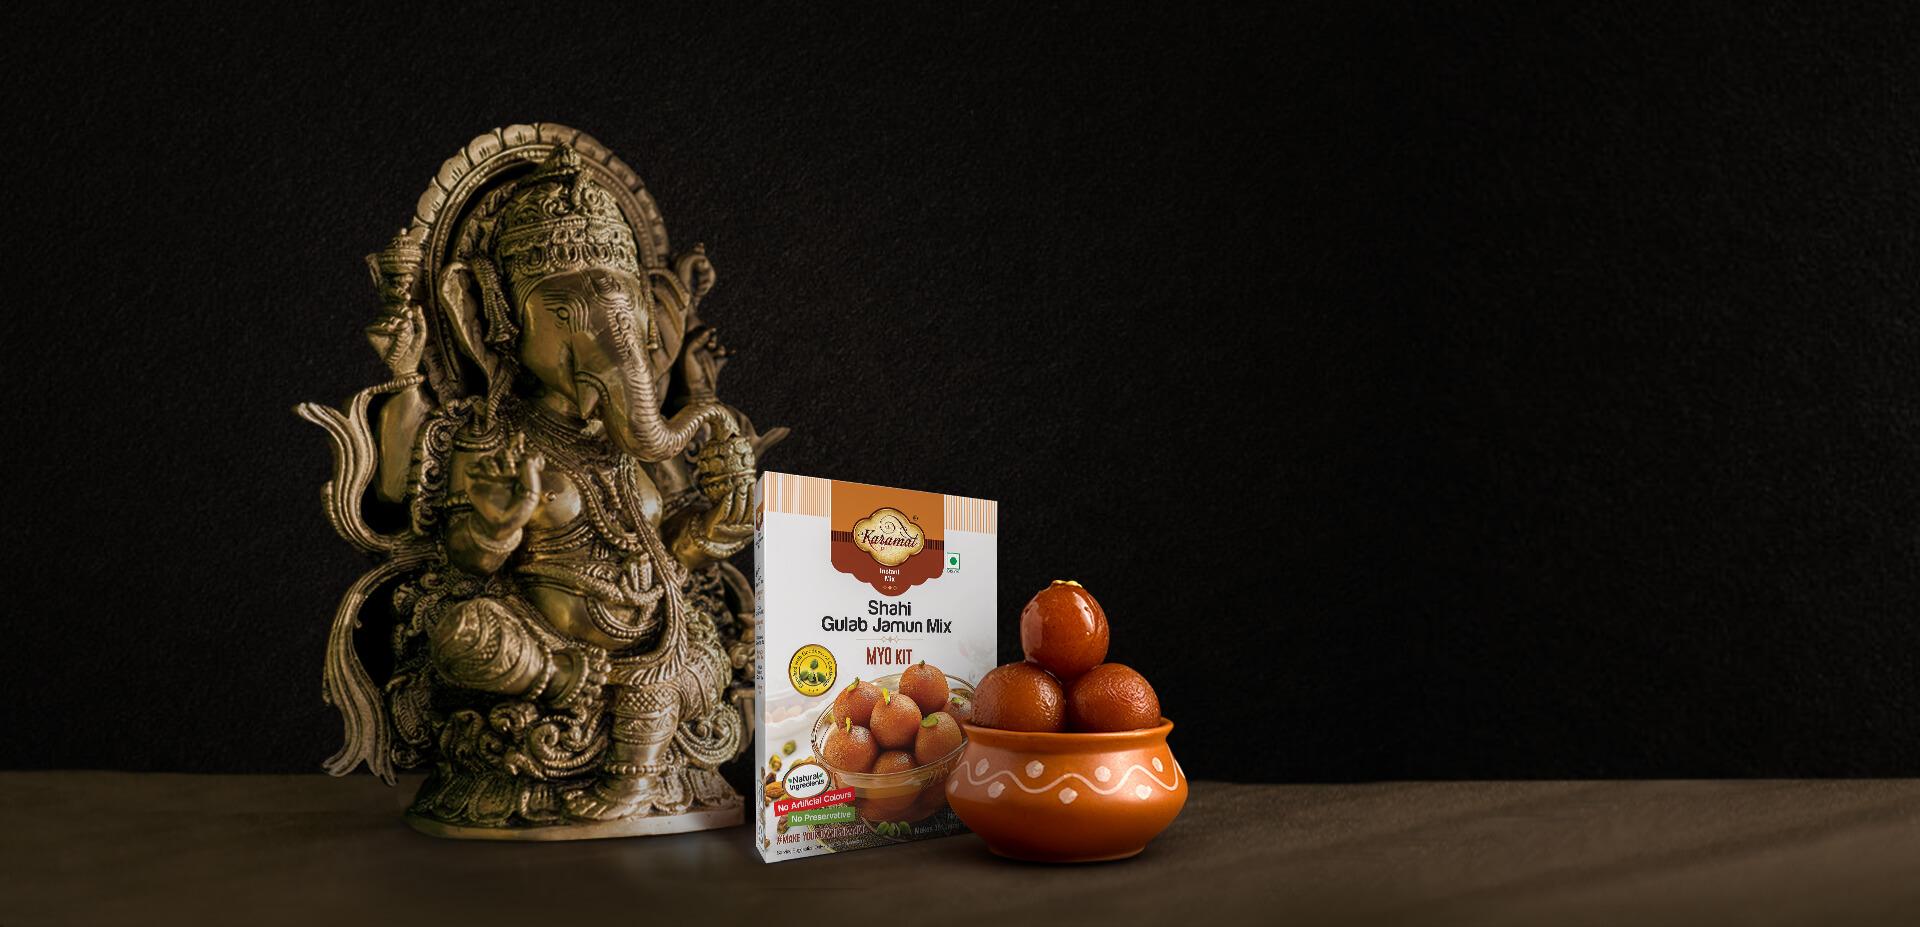 Ganesh-Chaturthi-banner